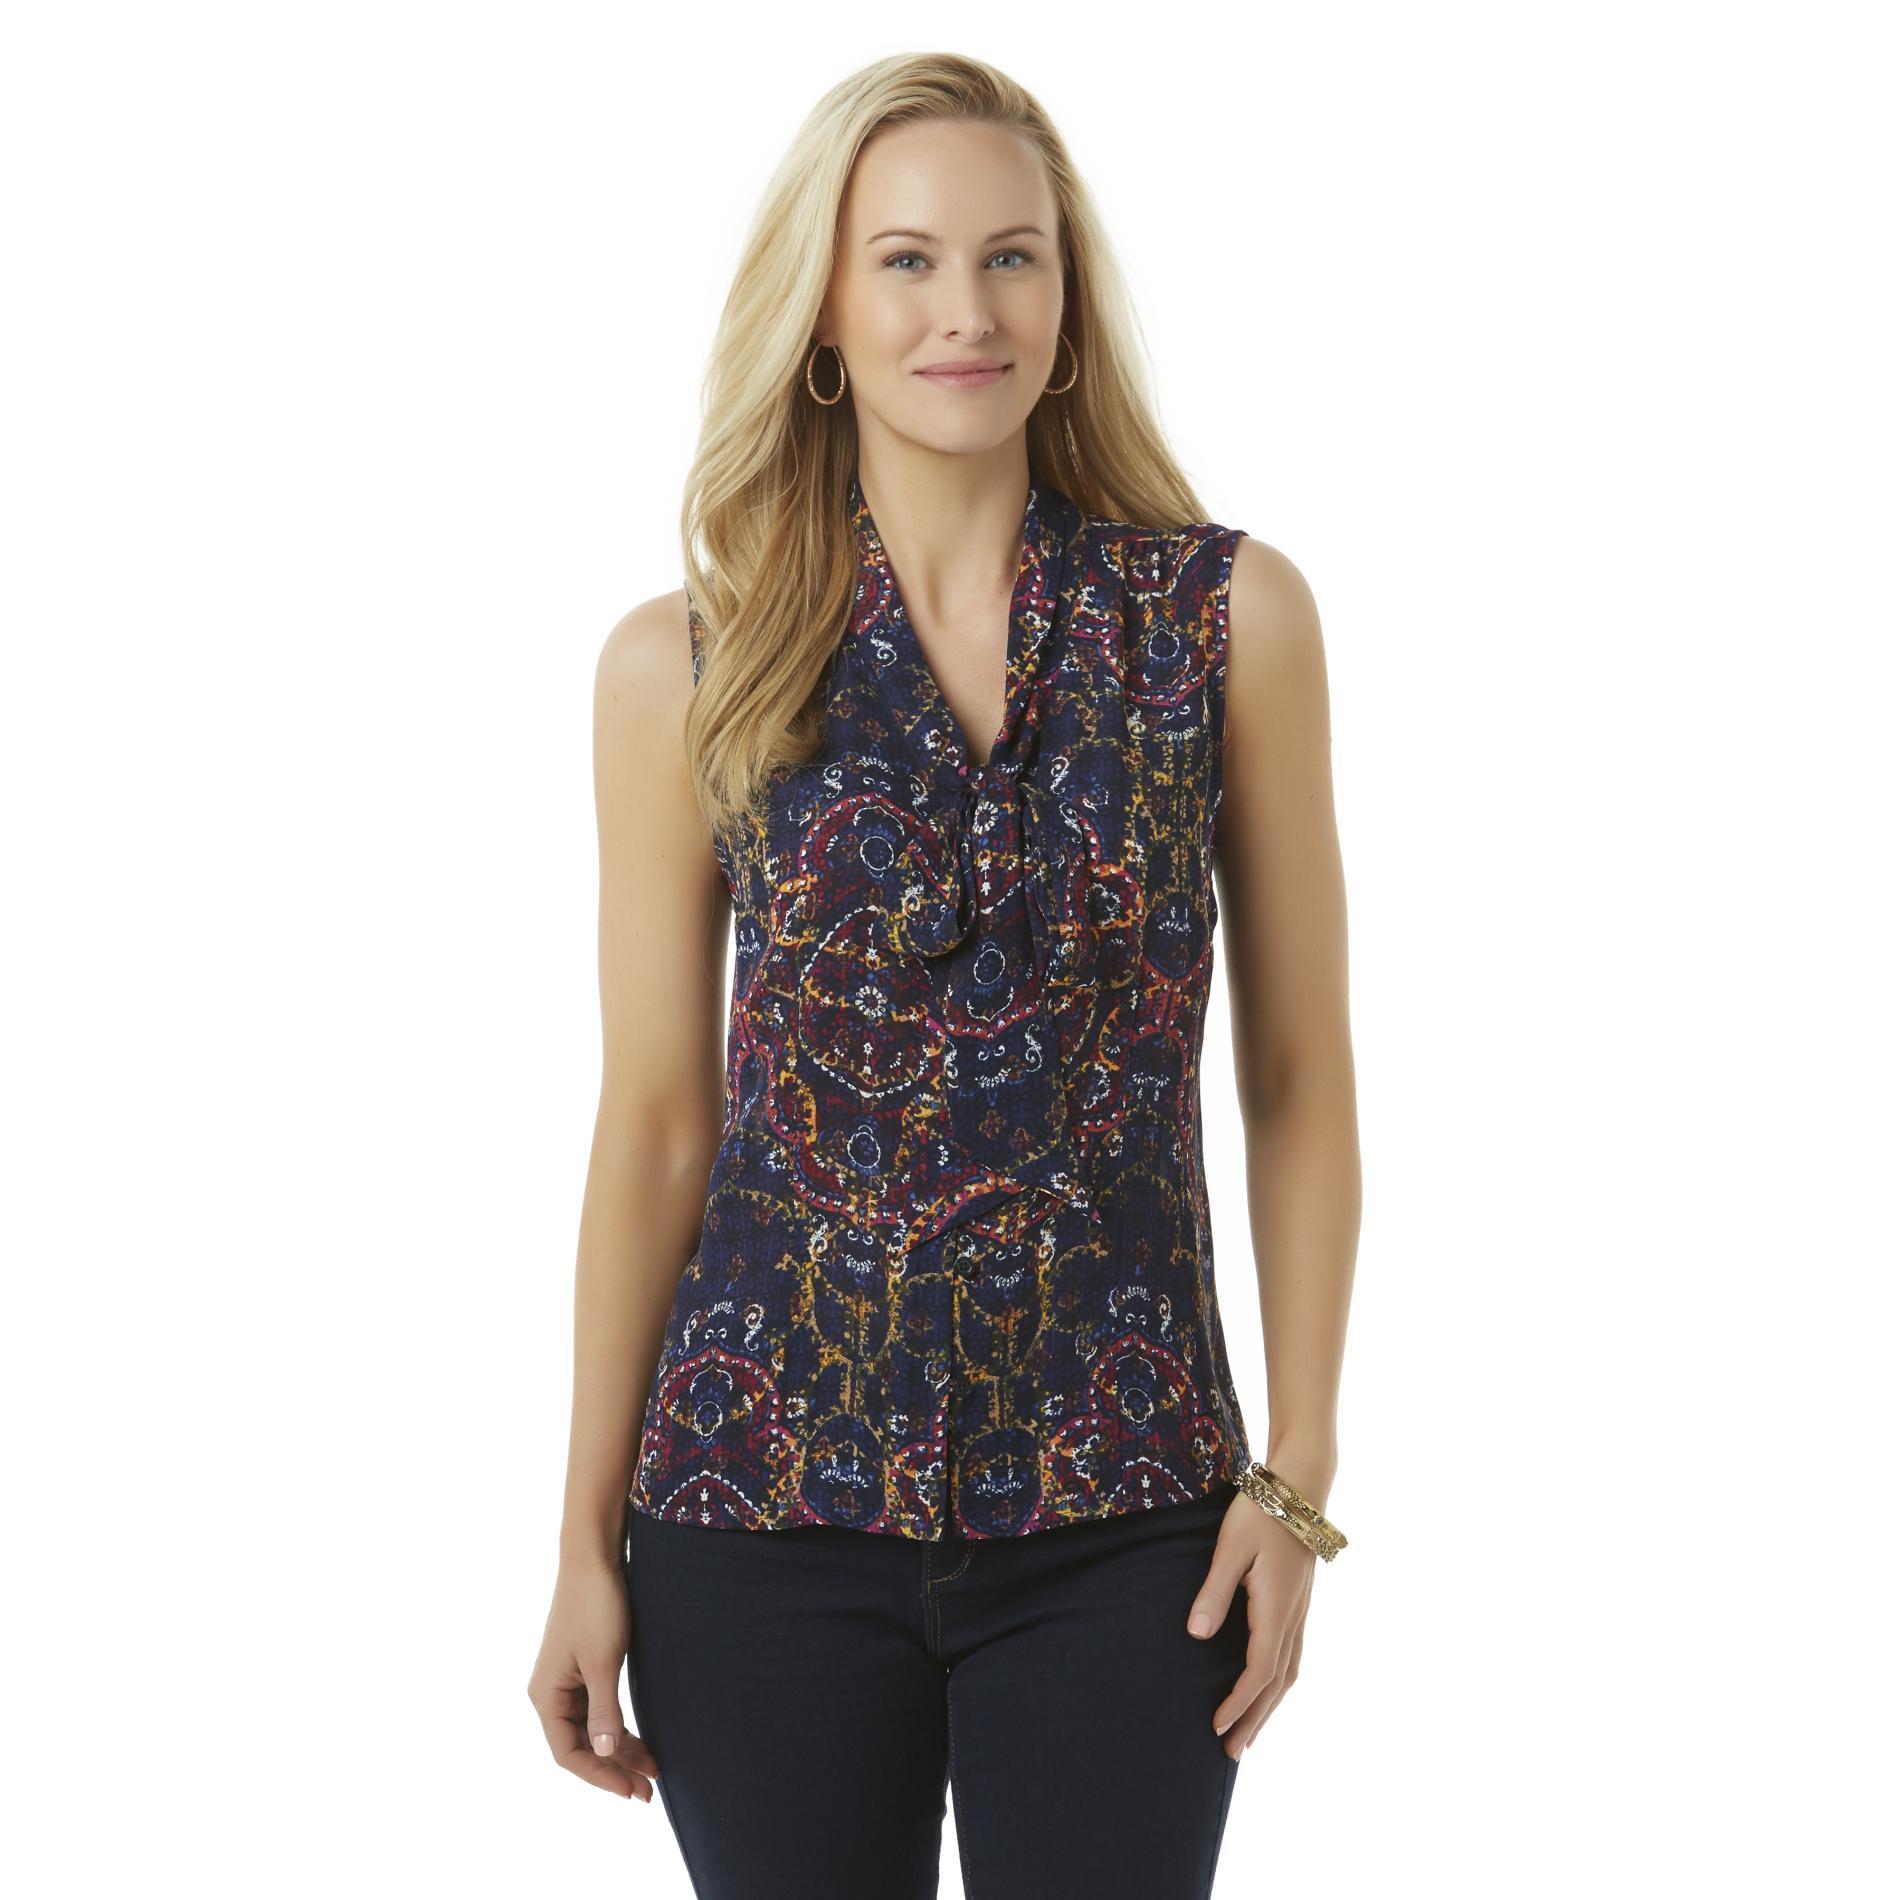 Covington Women's Sleeveless Tie Blouse - Scarf Print